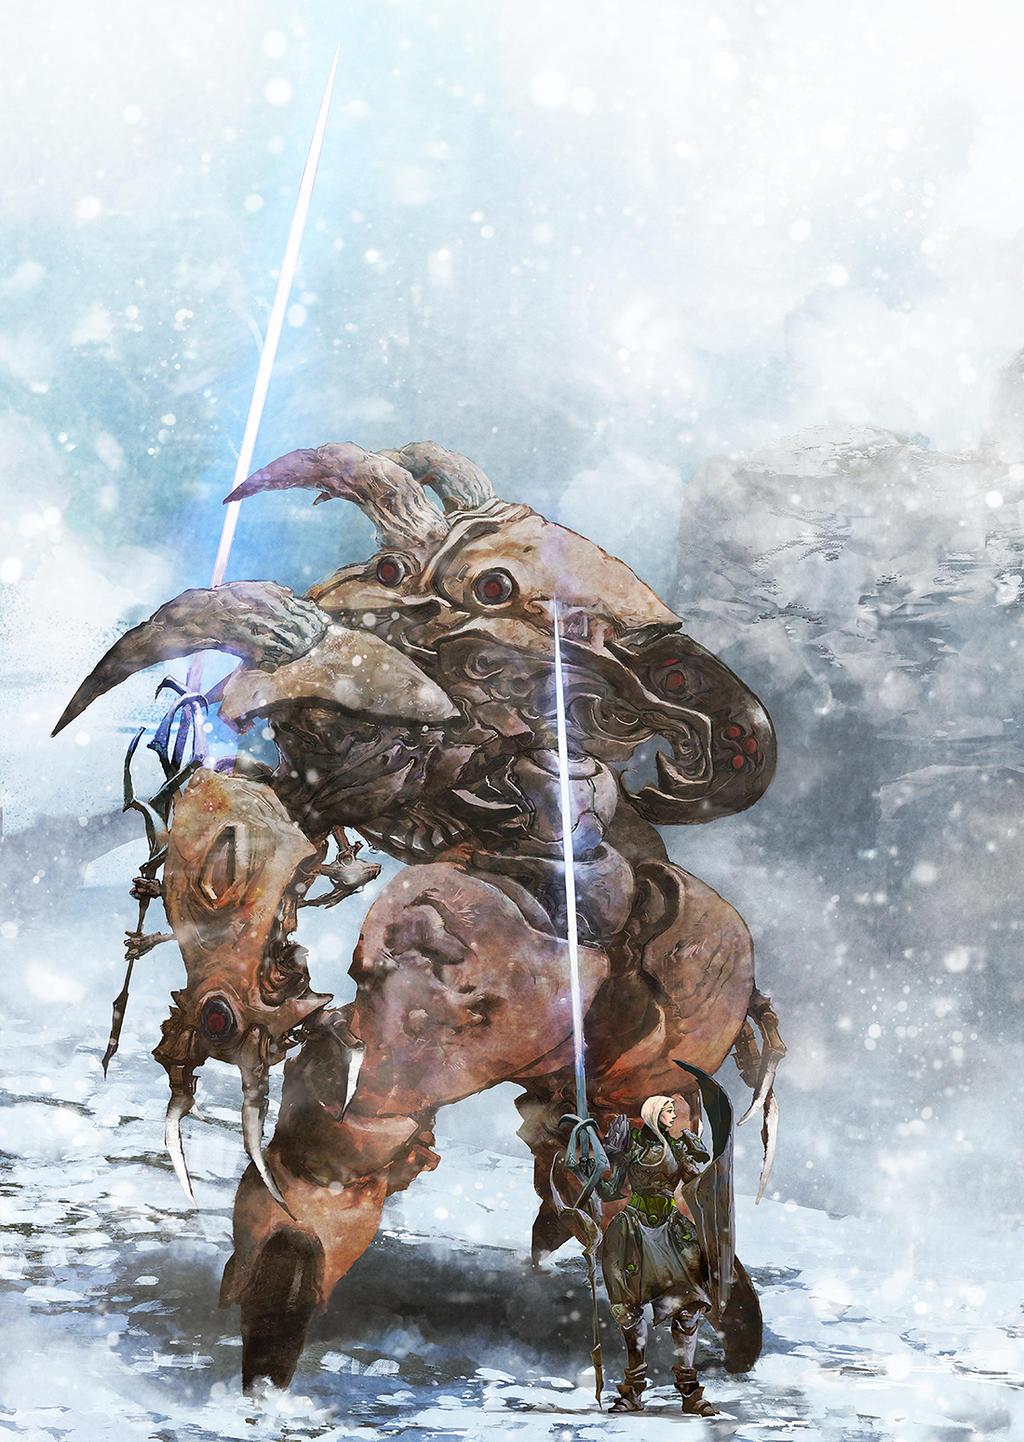 Siege Suit and Engineer by cobaltplasma